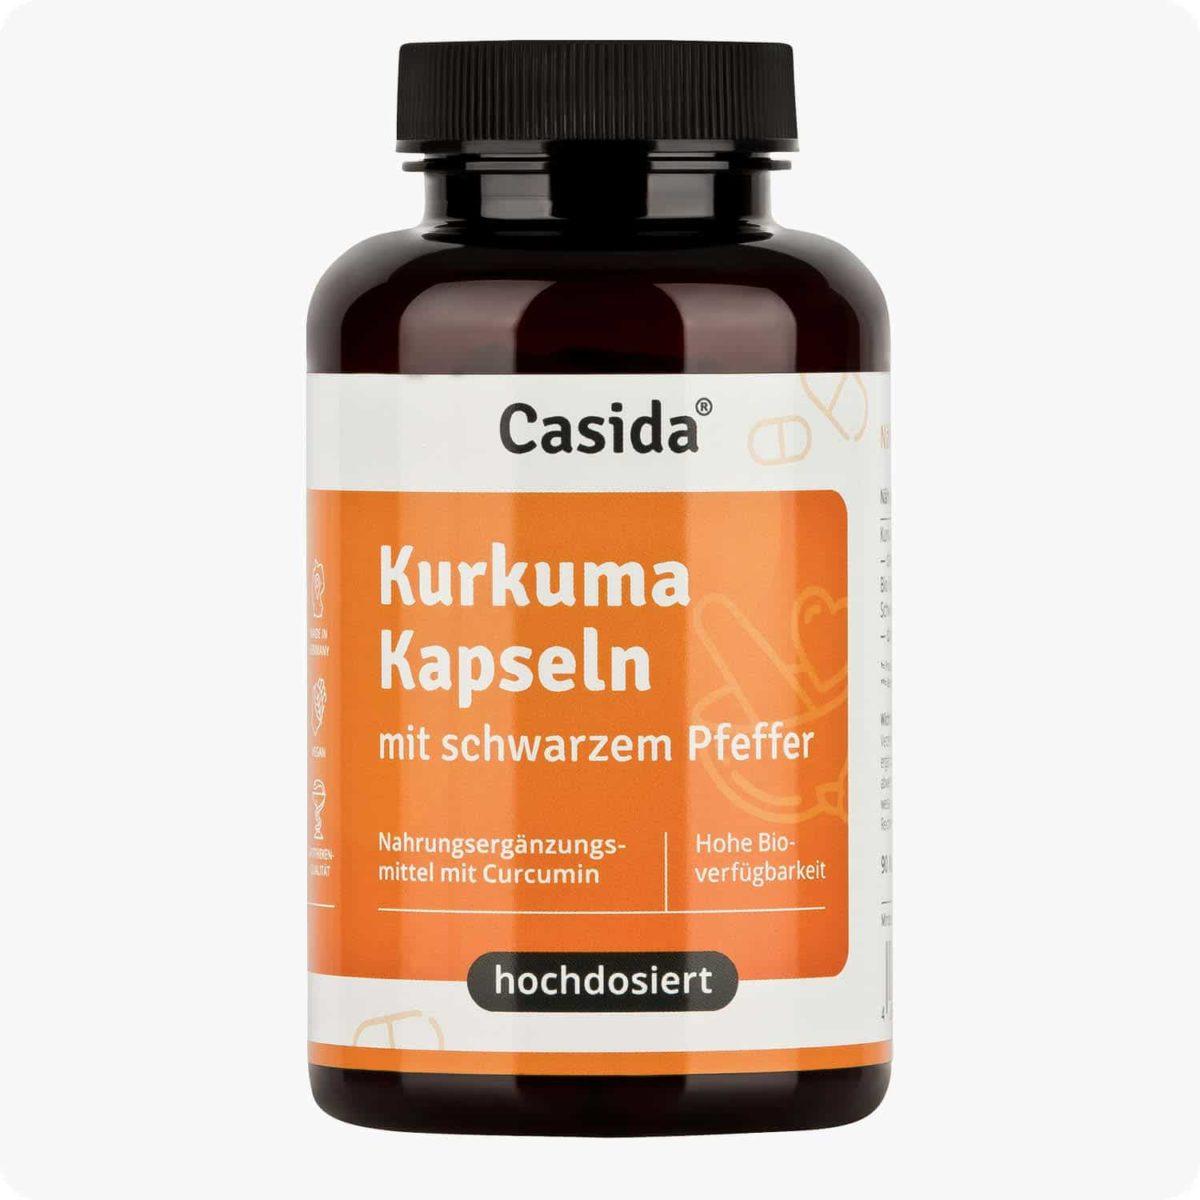 Casida Tumeric Capsules – 58 g 16671995 PZN Apotheke Schwarzer Pfeffer Nahrungsergänzung 2 (1)